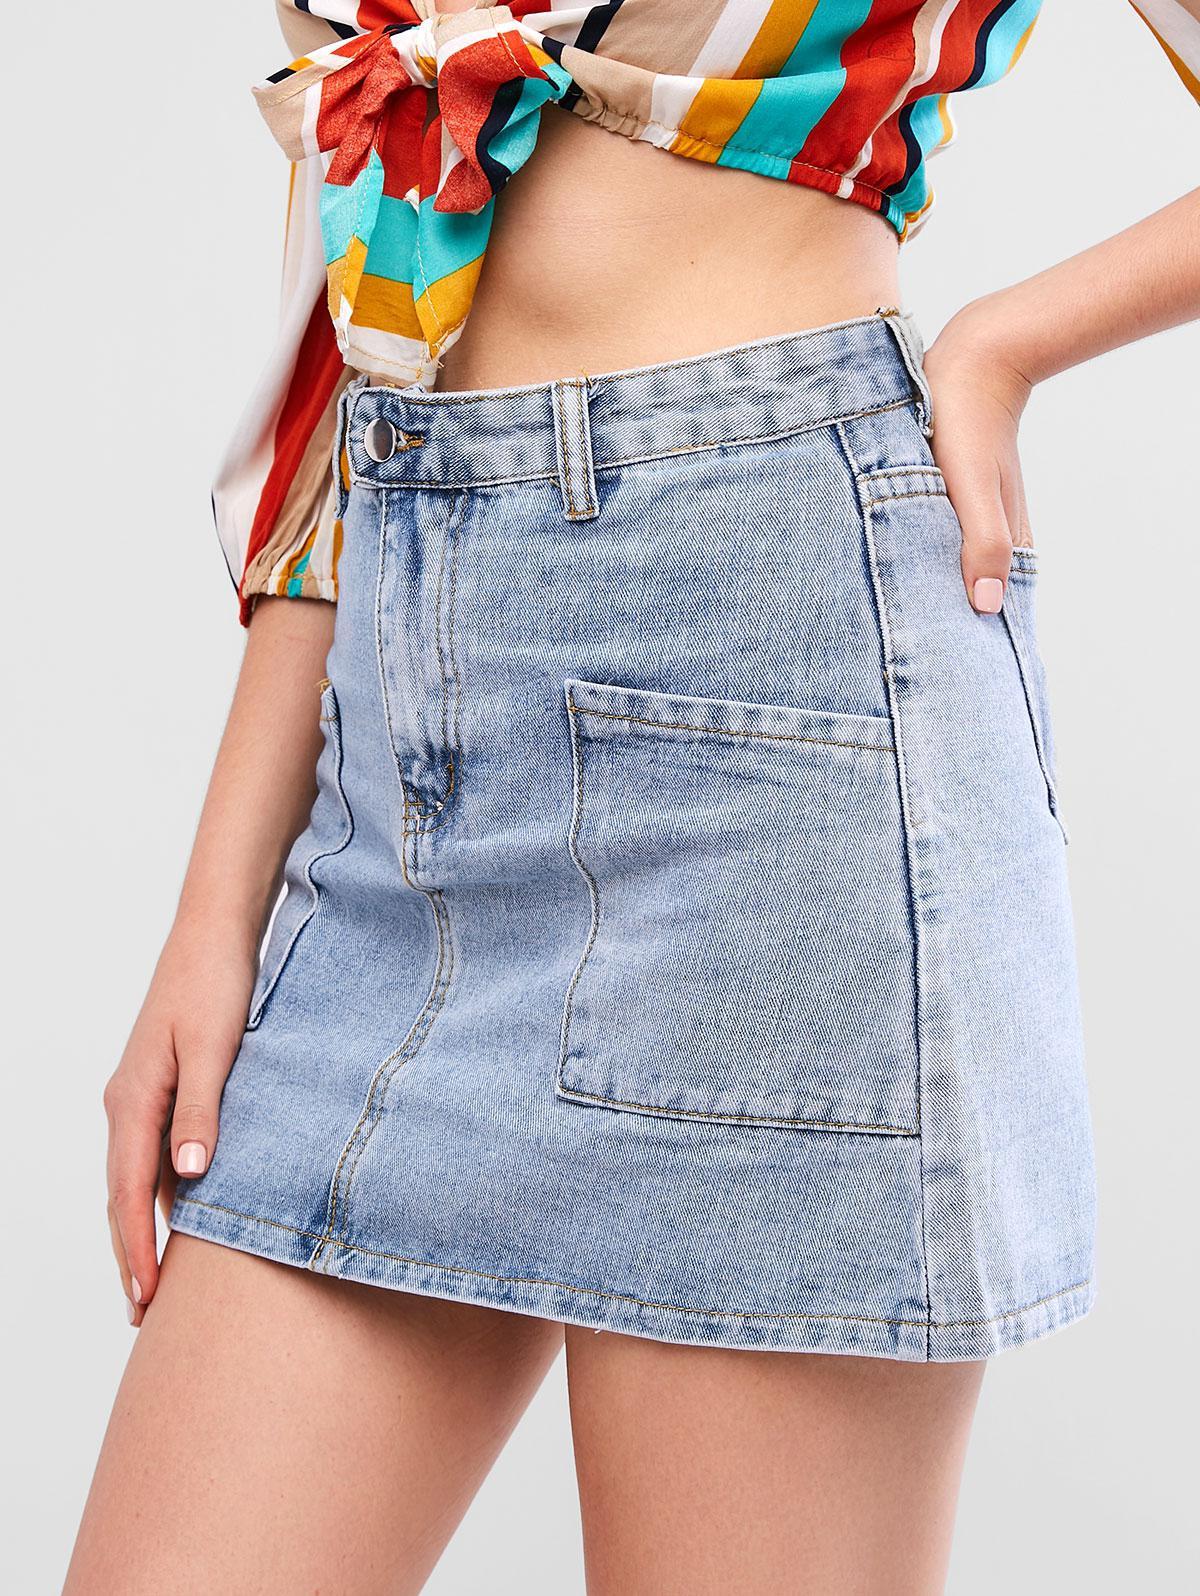 Una Linea Pocket Mini Gonna Di Jeans